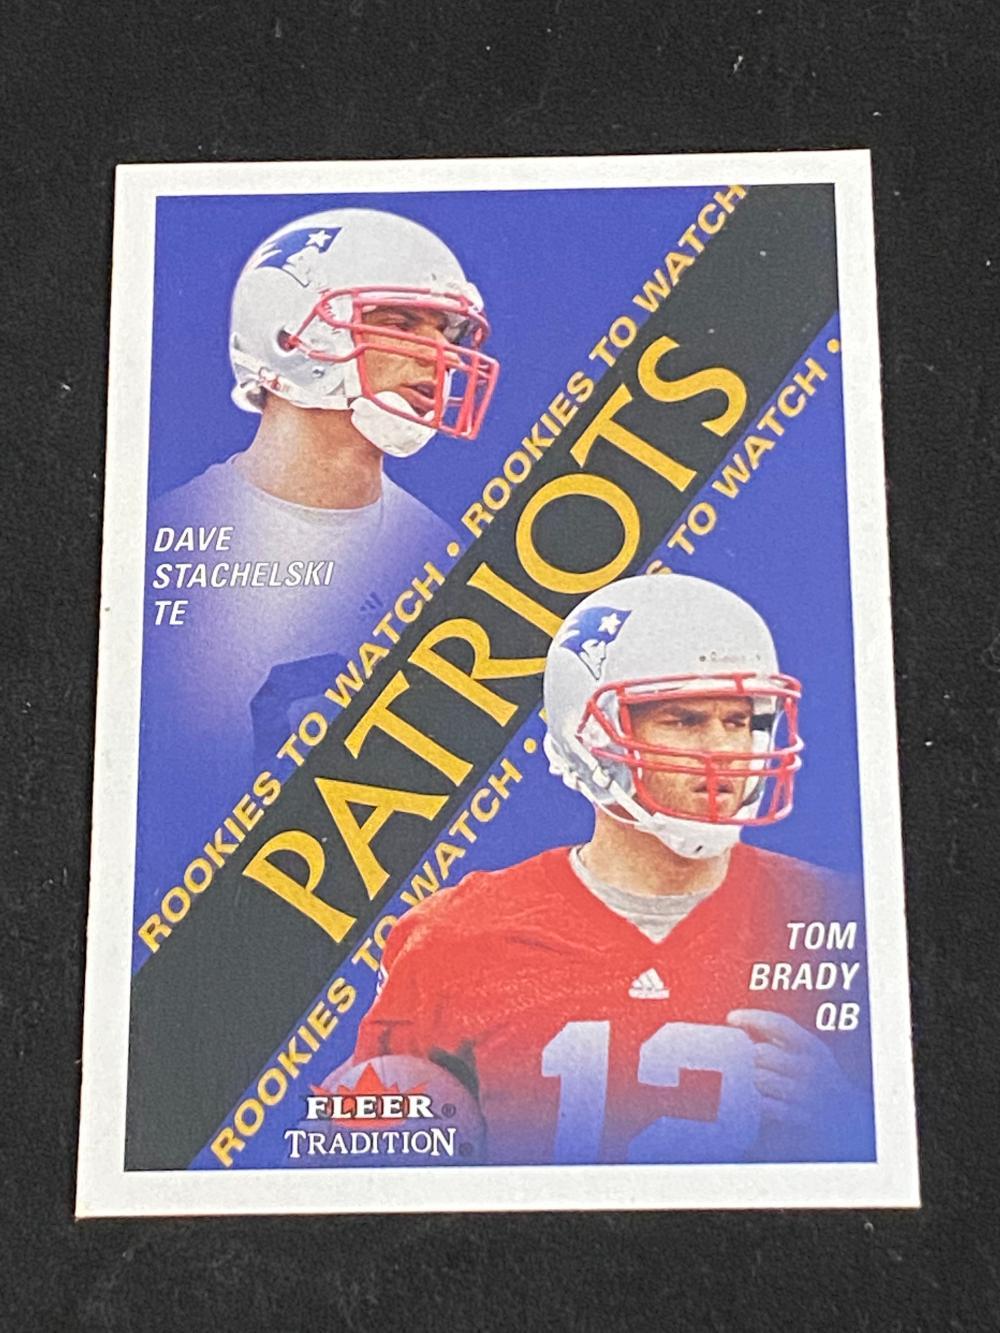 (Mint) 2000 Fleer Tom Brady Rookie #352 Football Card